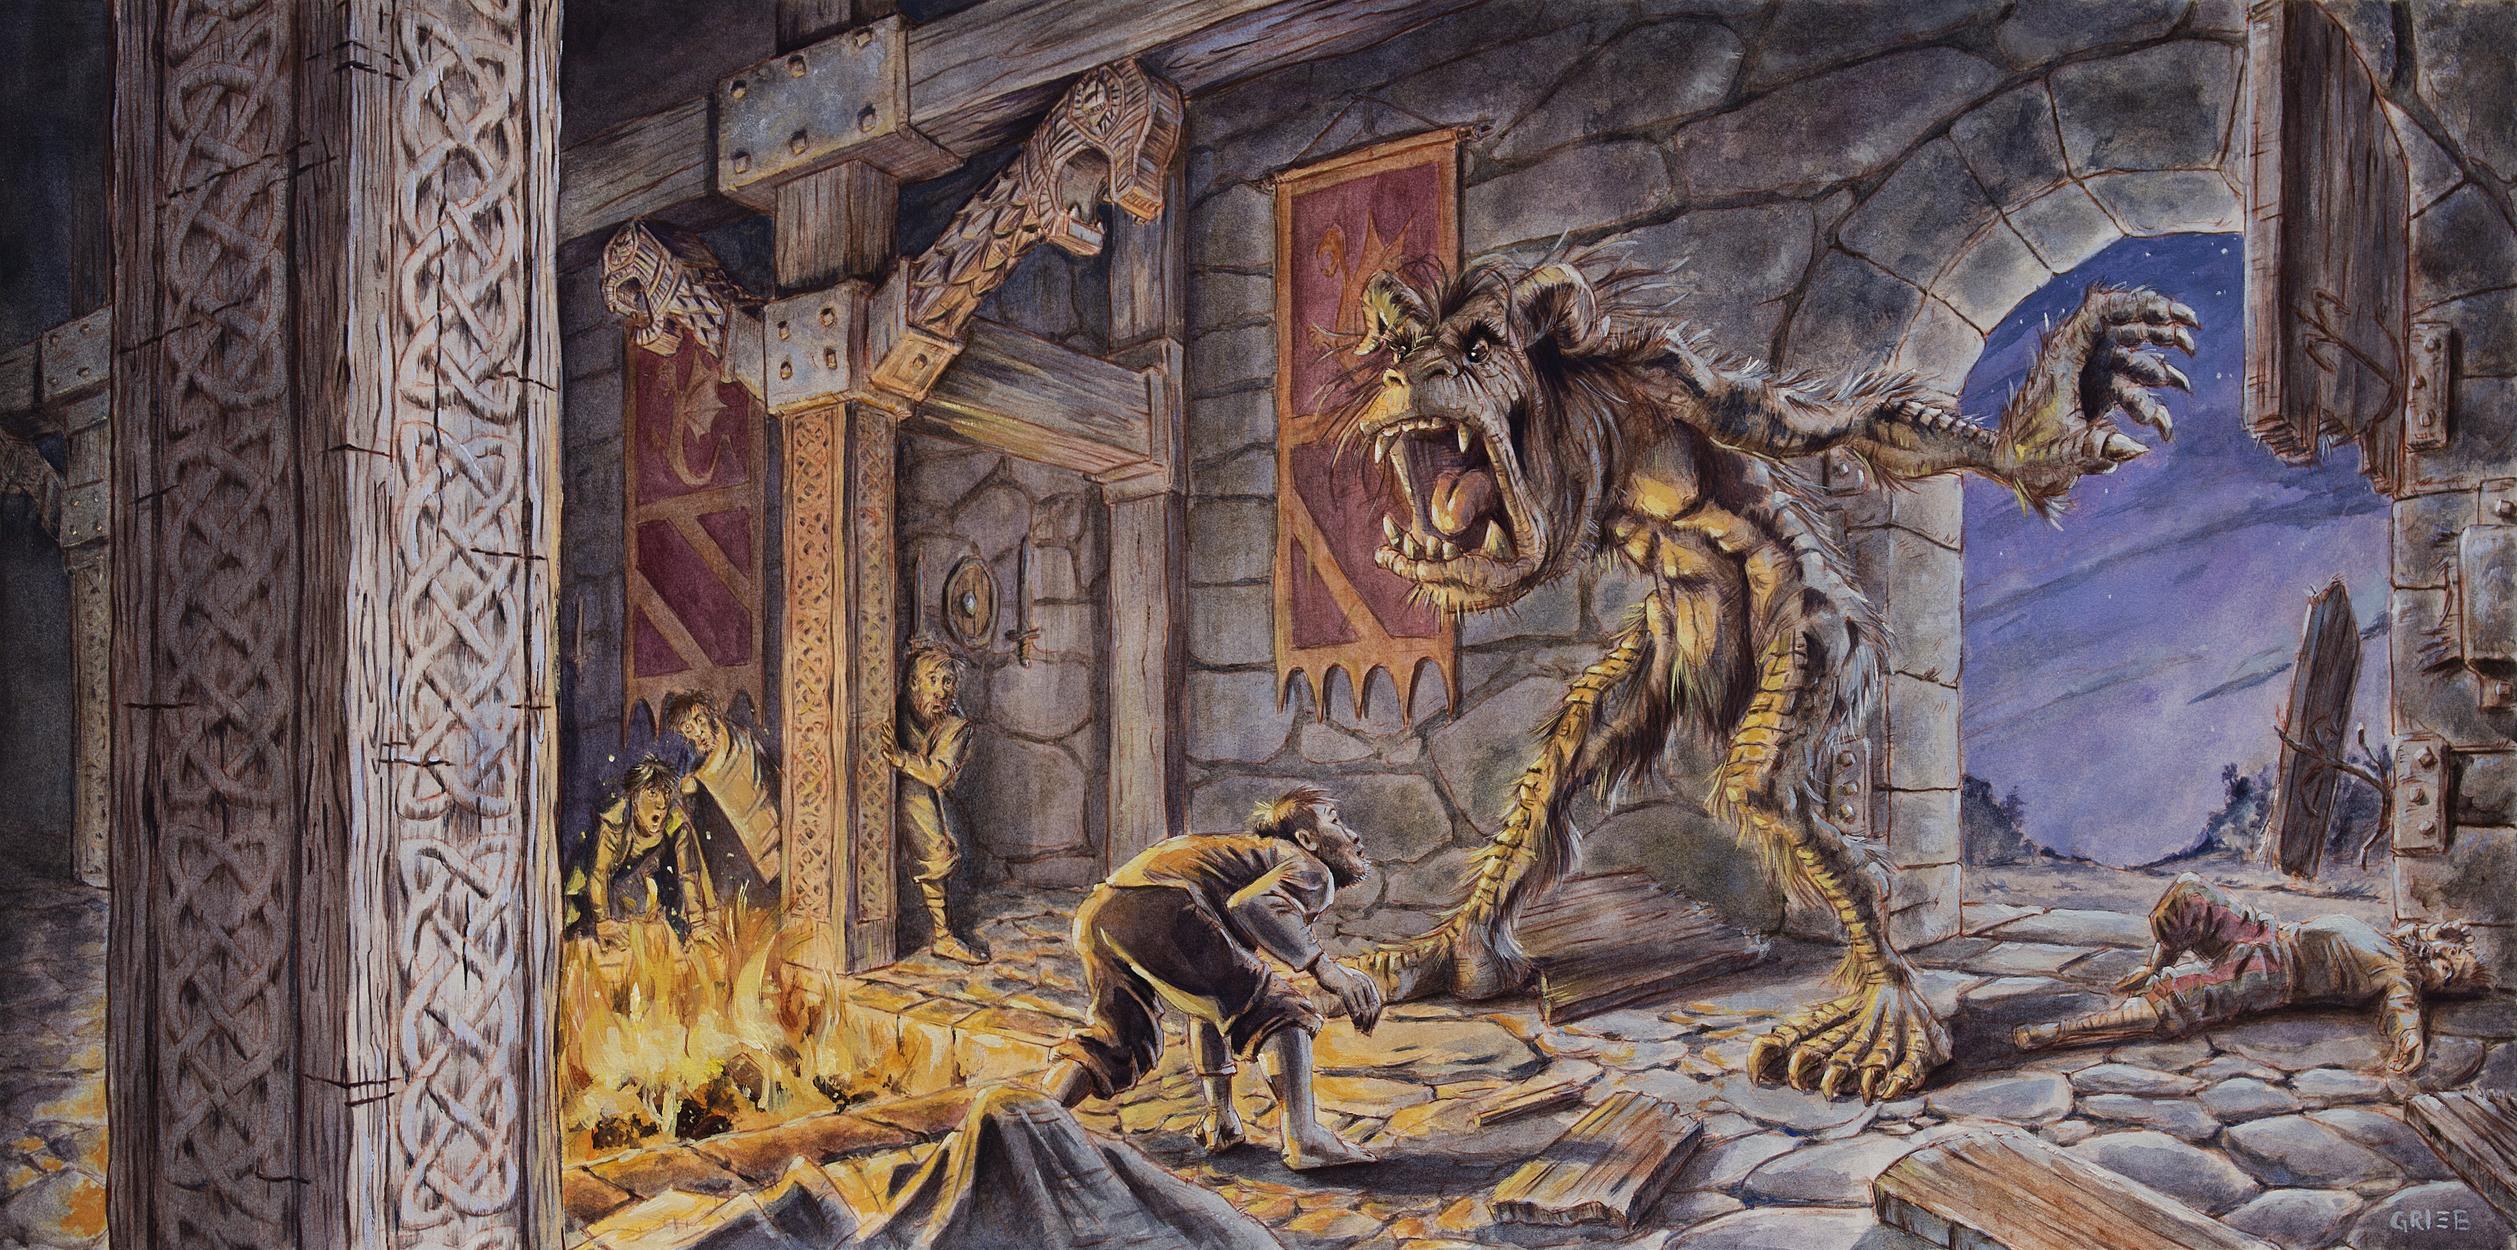 Grendel Artwork by Chuck Grieb